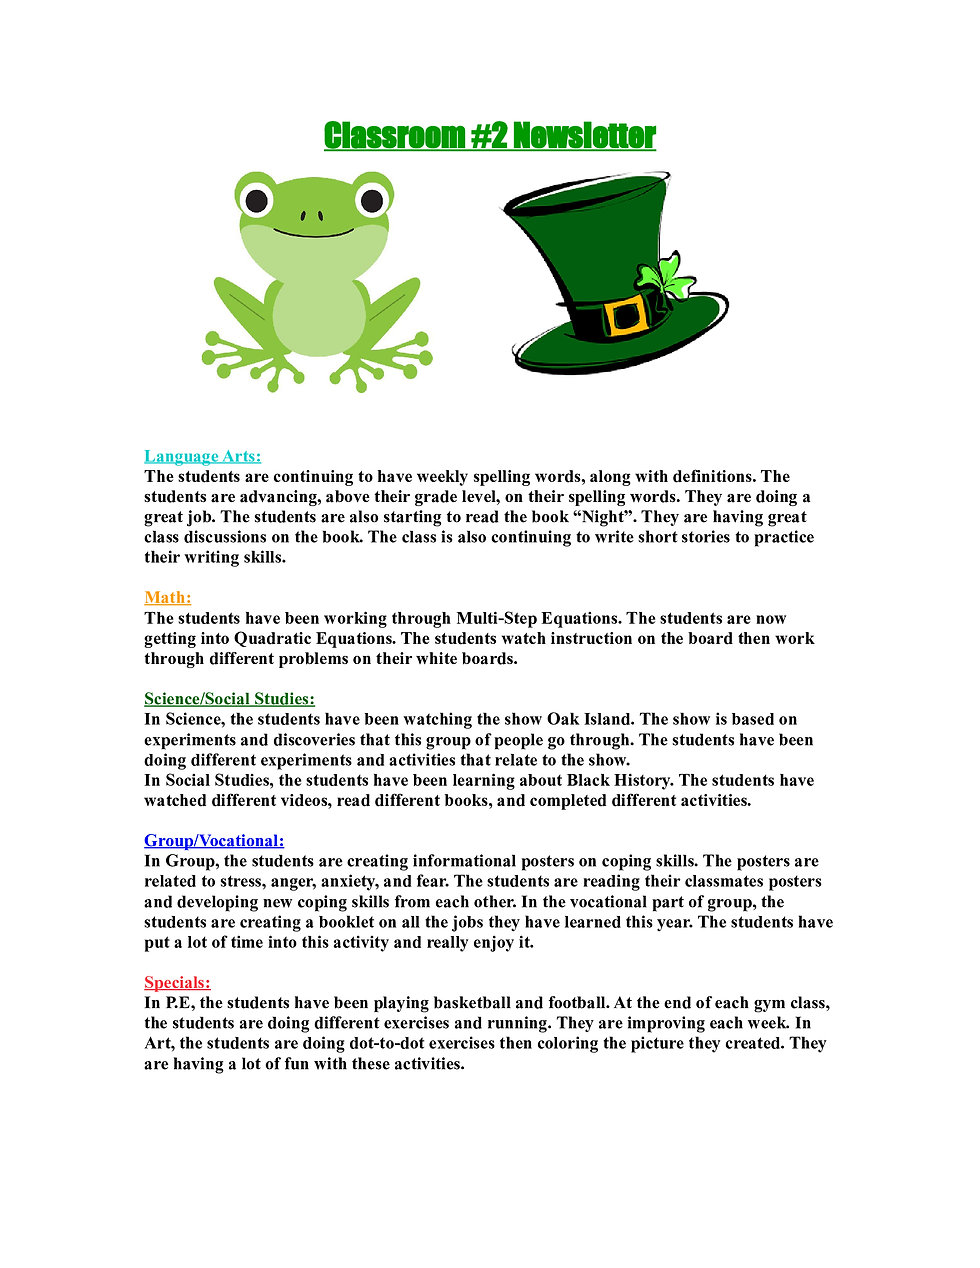 Classroom-_2-Newsletter-Q3.jpg